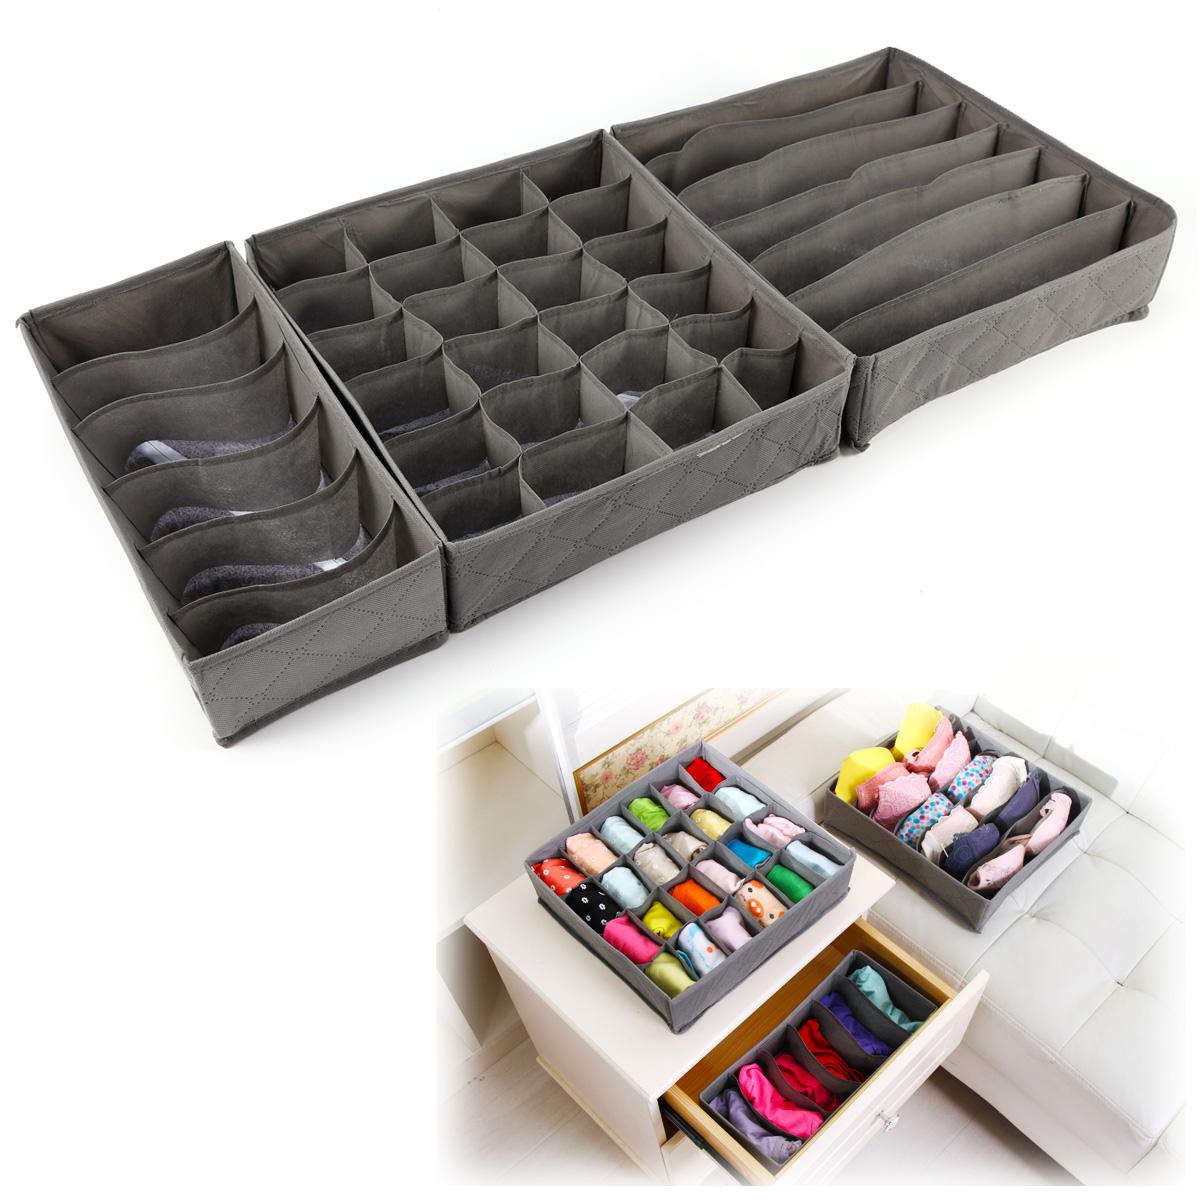 kit 3pcs bo te de rangement pliable non tiss sac organisateur sous v tement. Black Bedroom Furniture Sets. Home Design Ideas